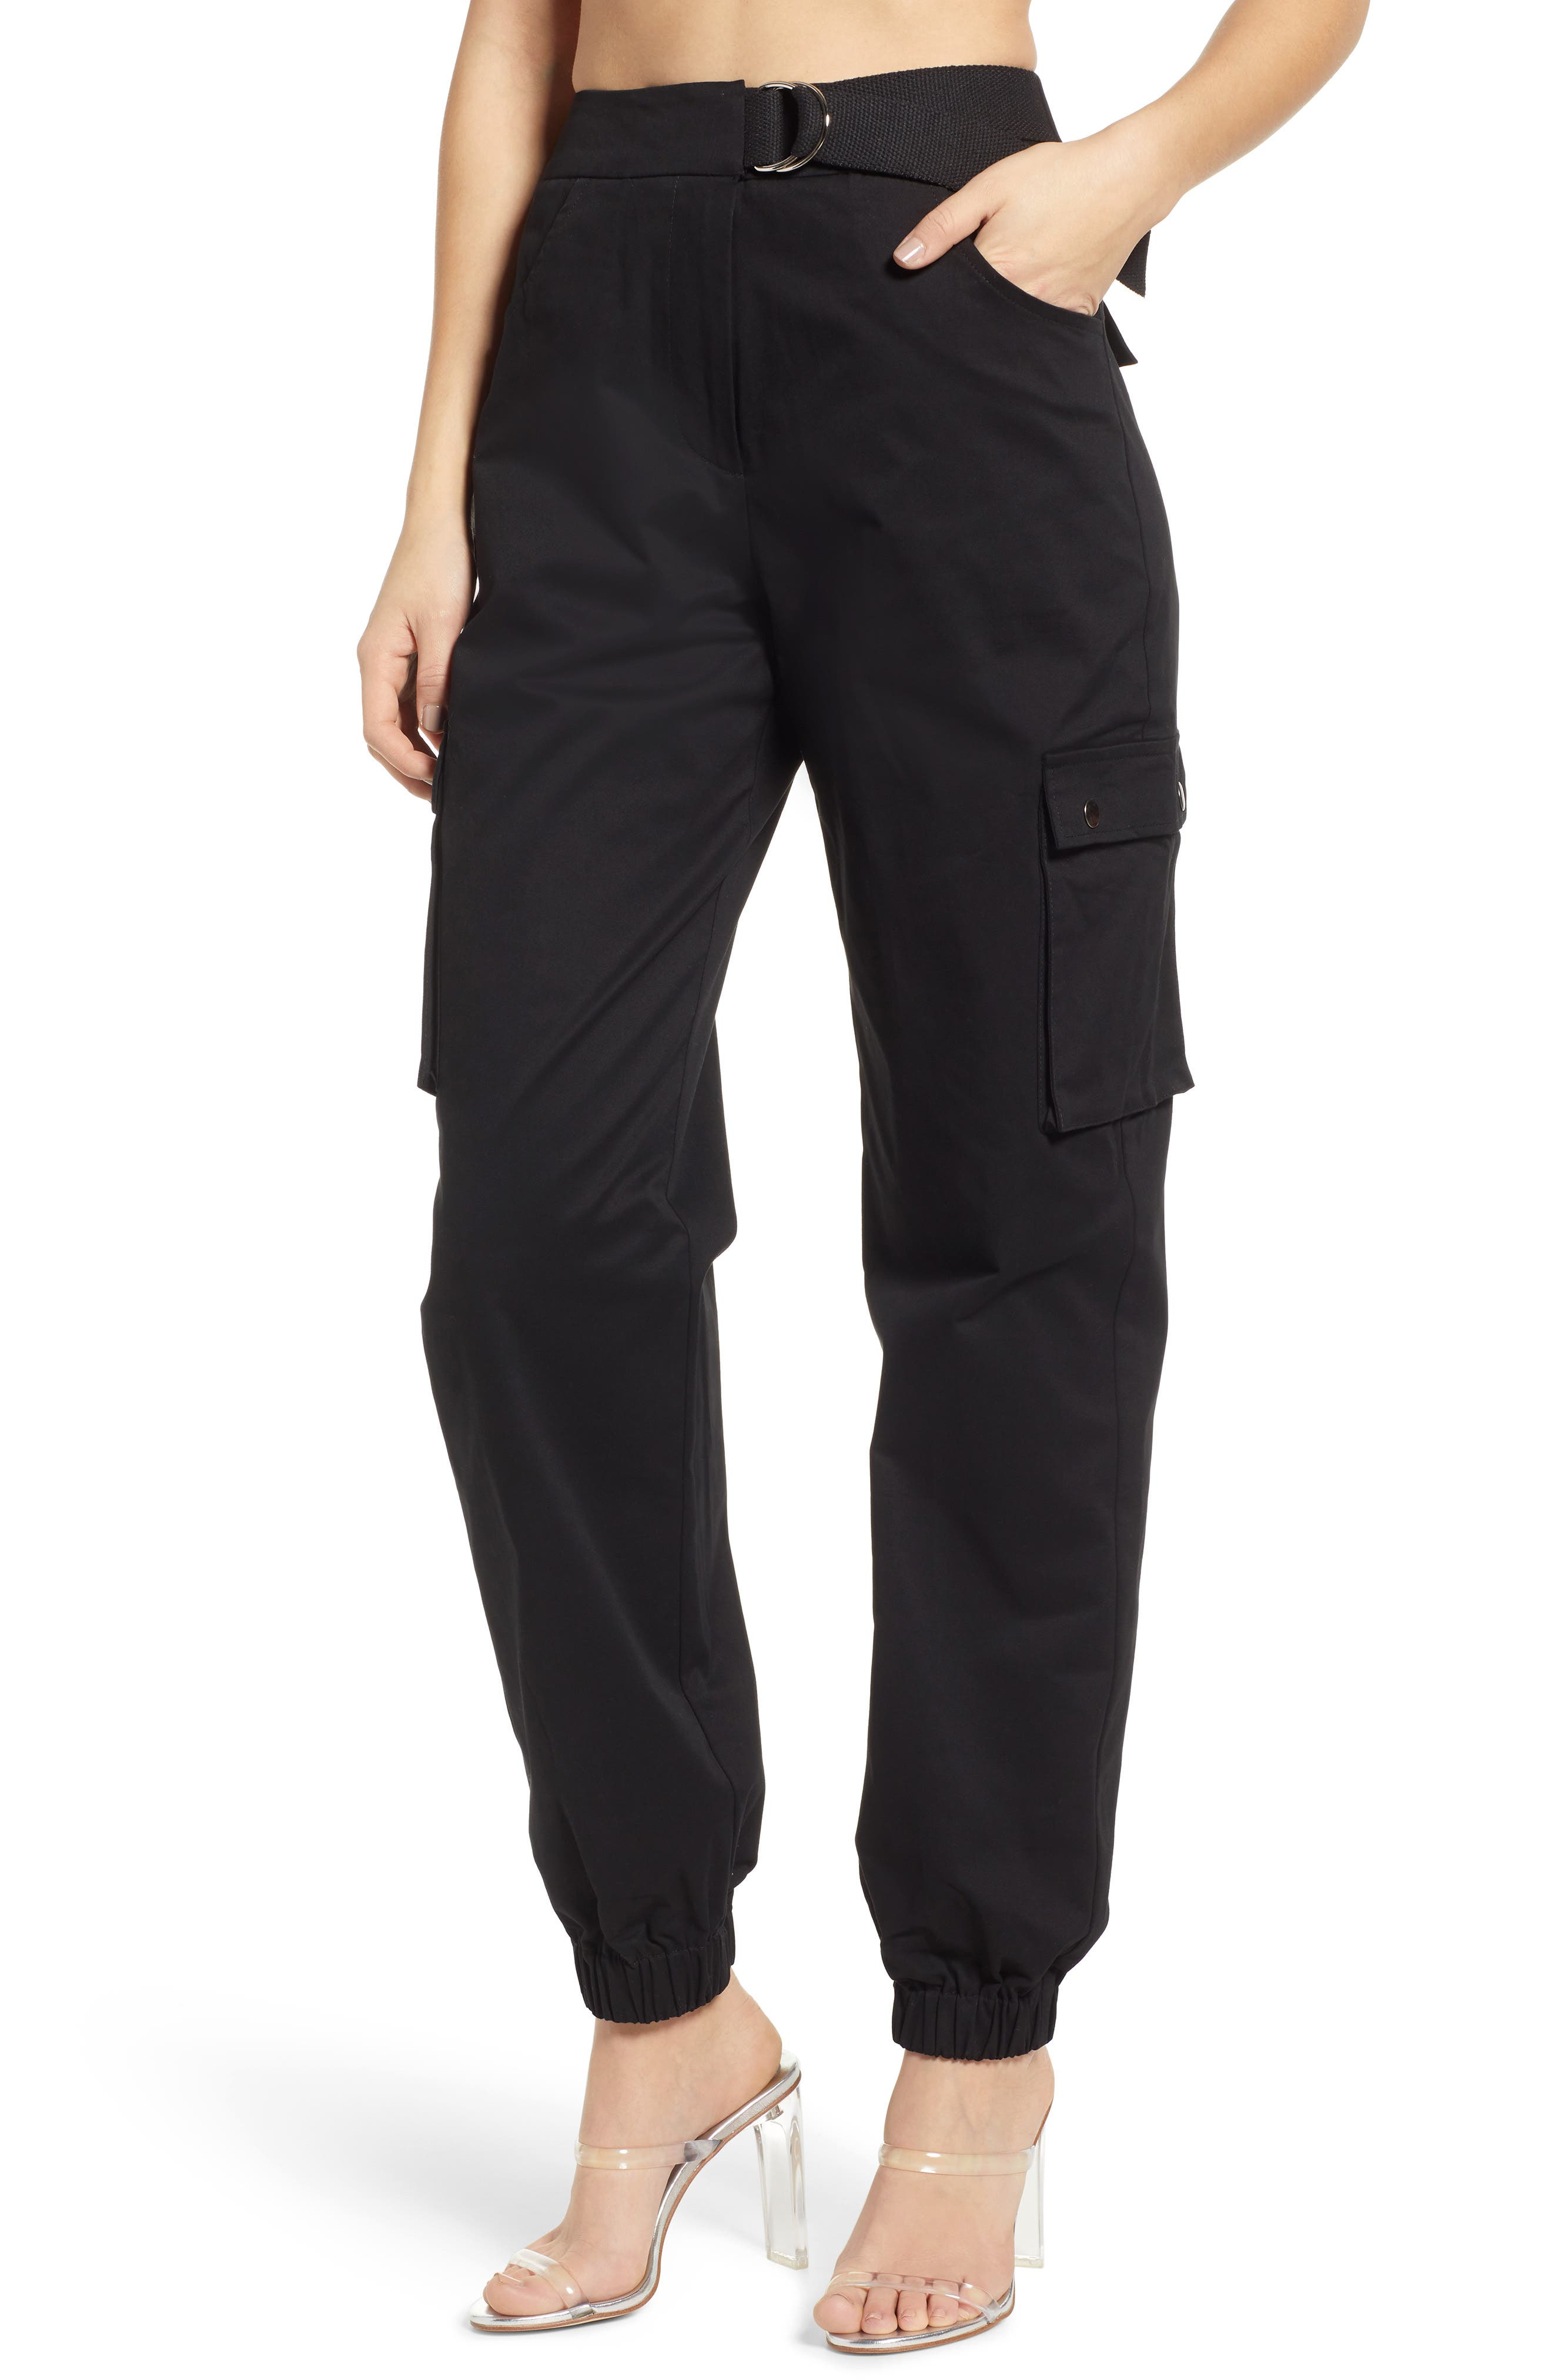 Tiger Mist Aliyah Cargo Pants, Black